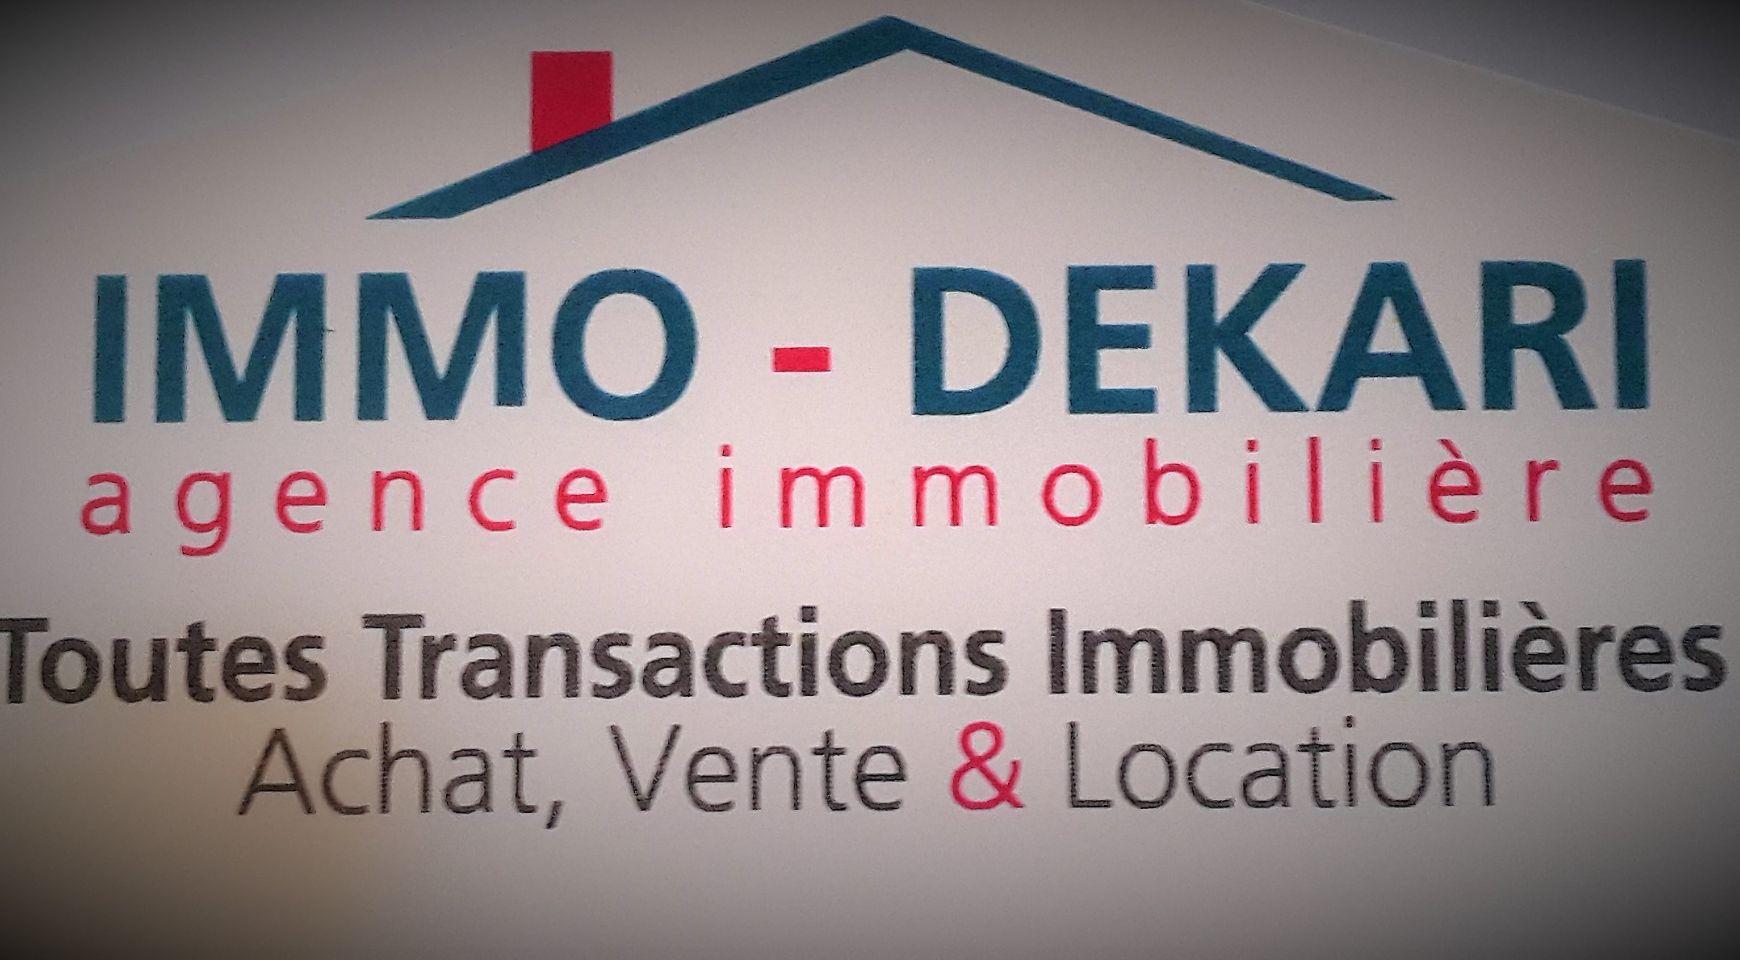 Agence immobili re immo dekari el mouradia alger for Agence immobiliere alger